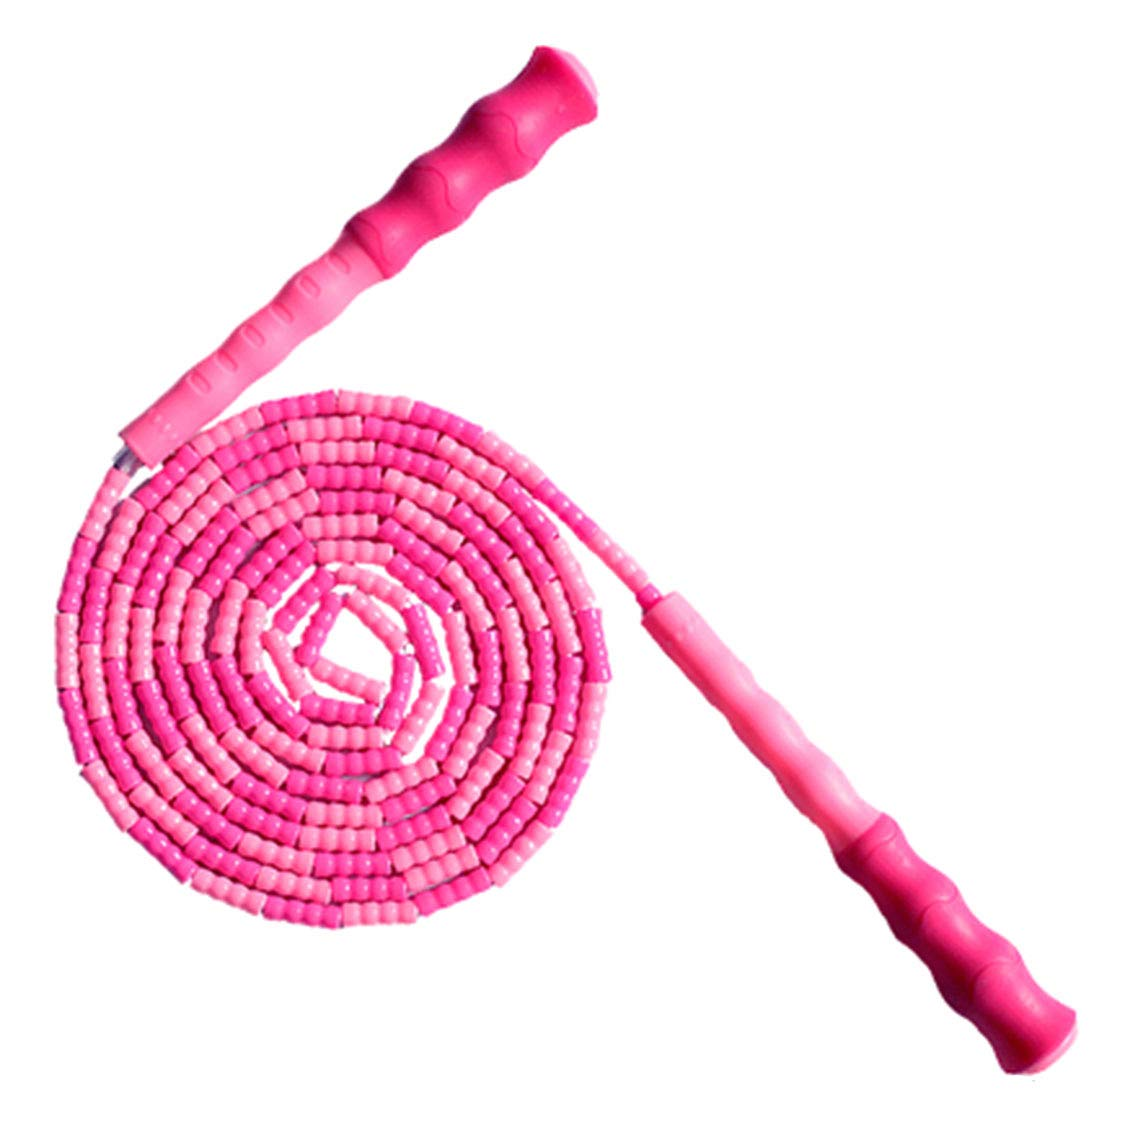 LETUSPORT 9 Feet Adjustable Beaded Segmented Jump Rope for Women Men Kids Lightweight Work Out Speed Jumping Ropes (Pink, 1 pcs)